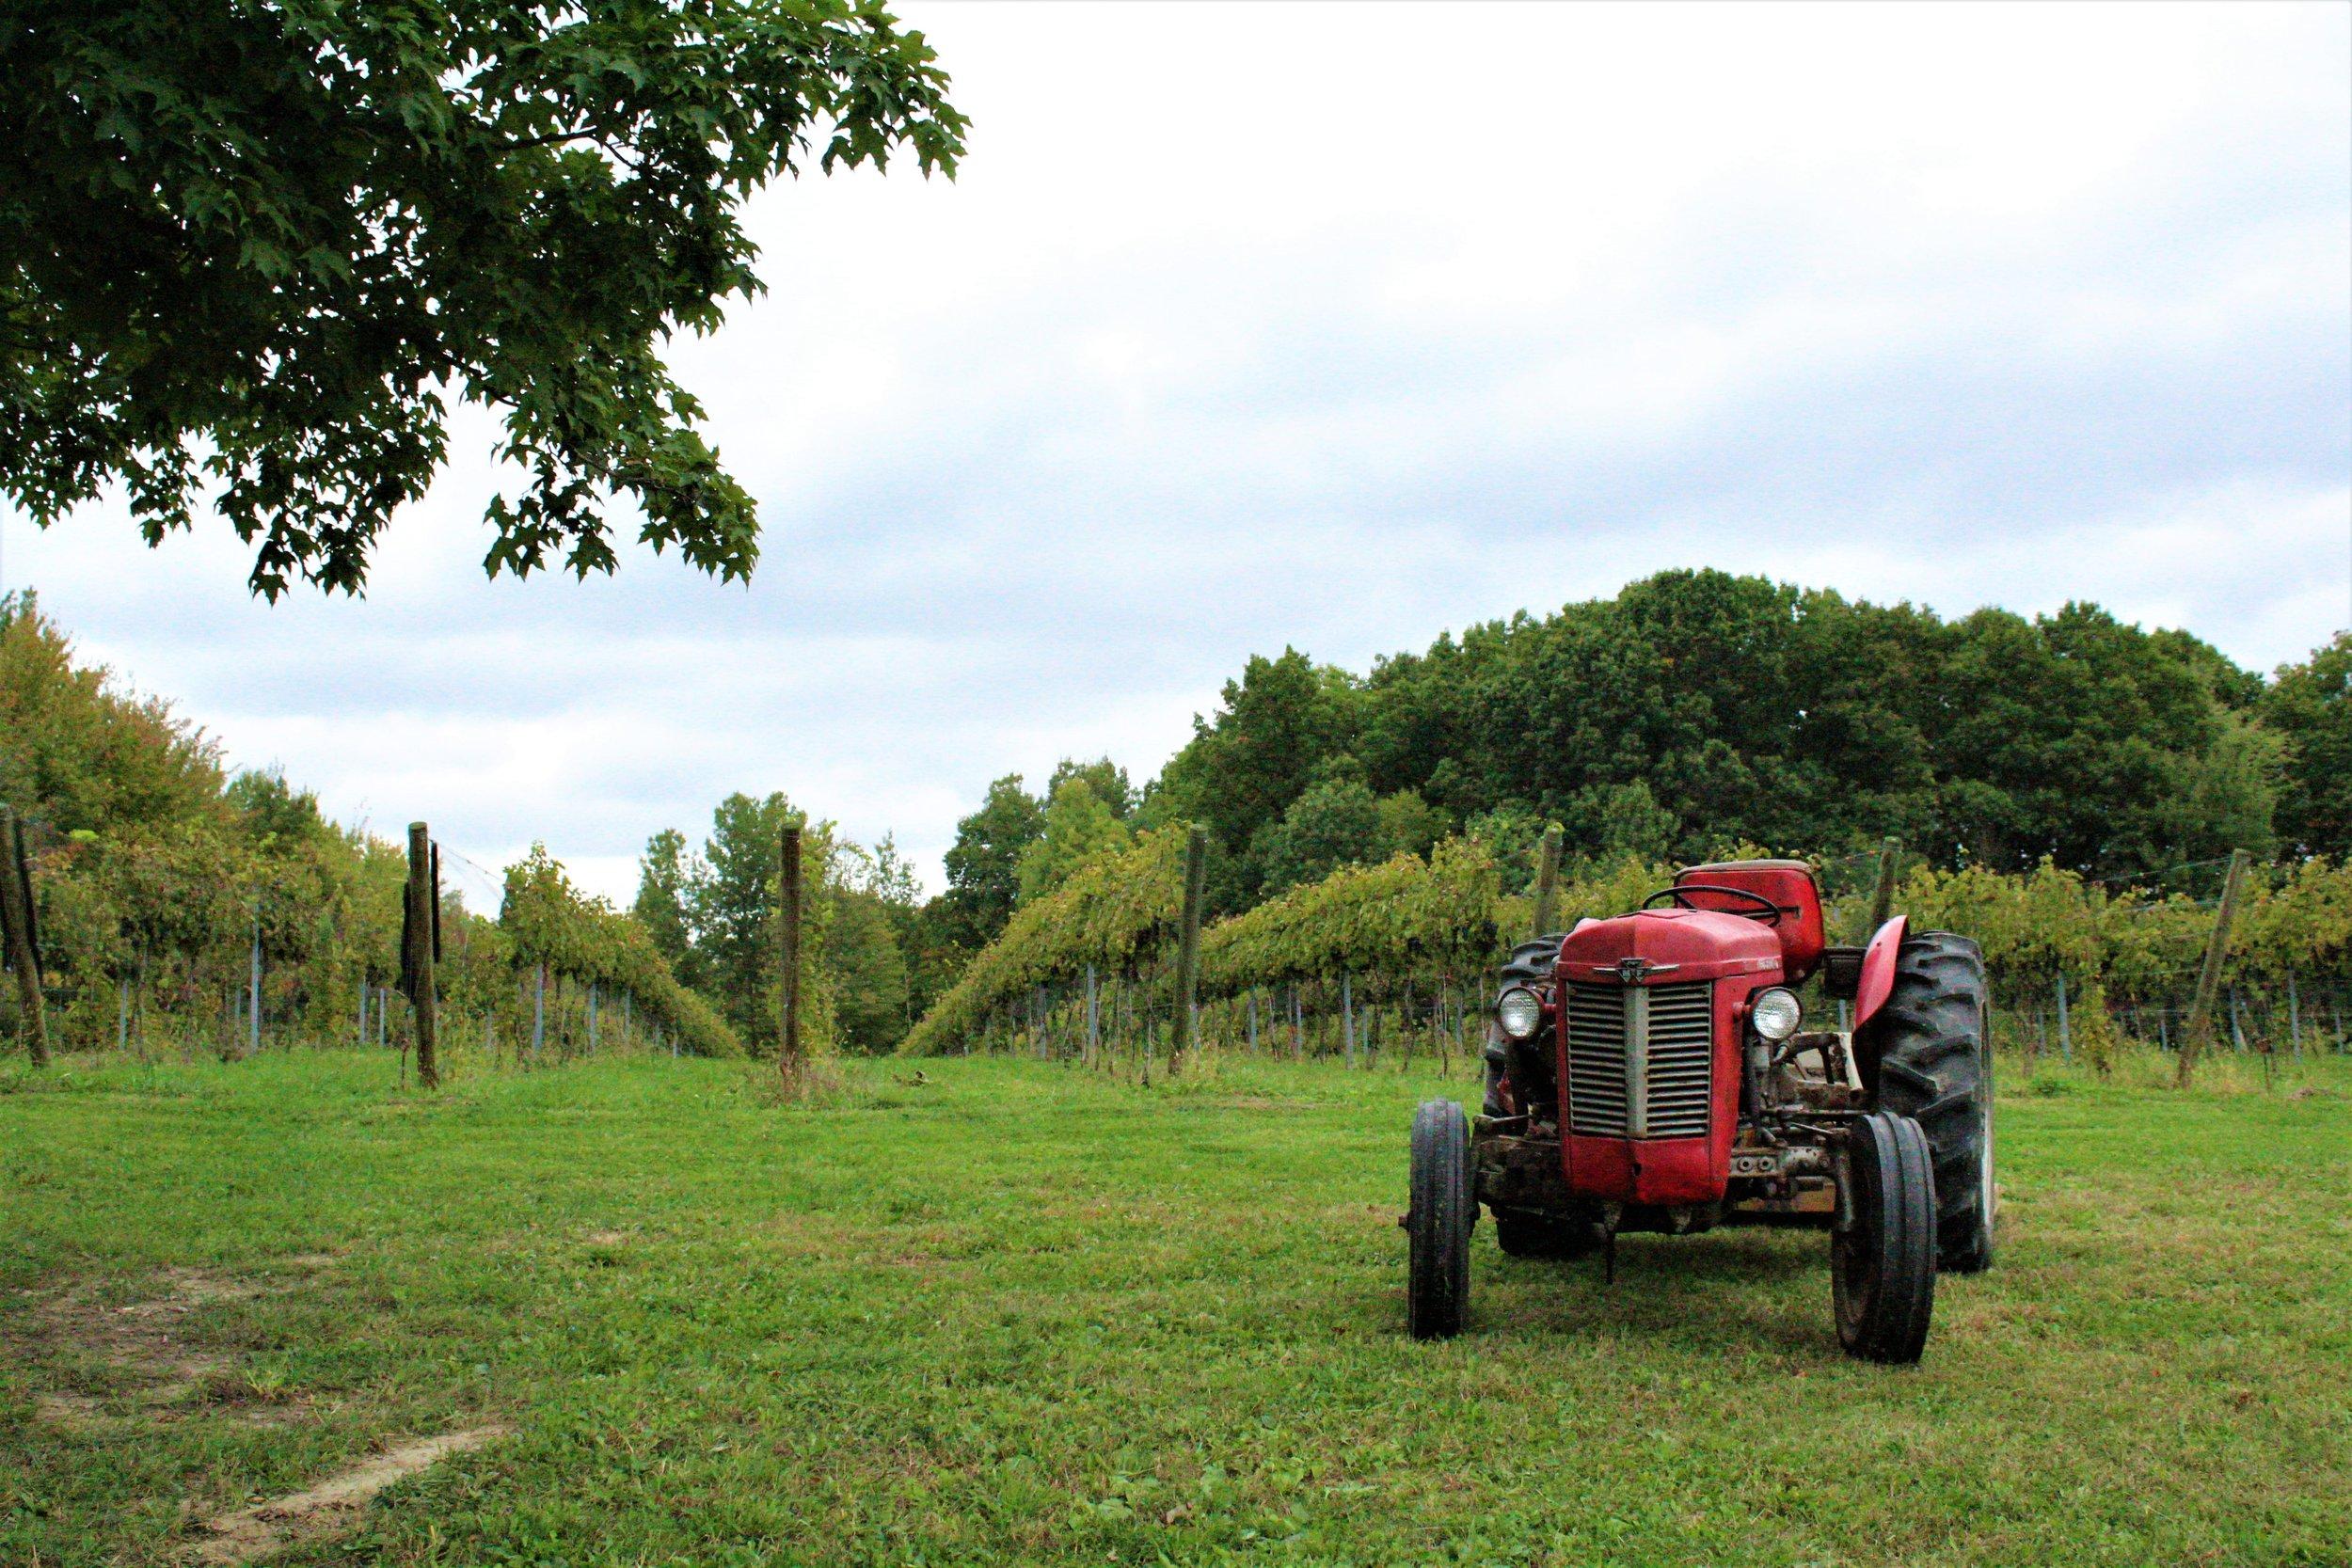 Silver Crest Tractor2.jpg